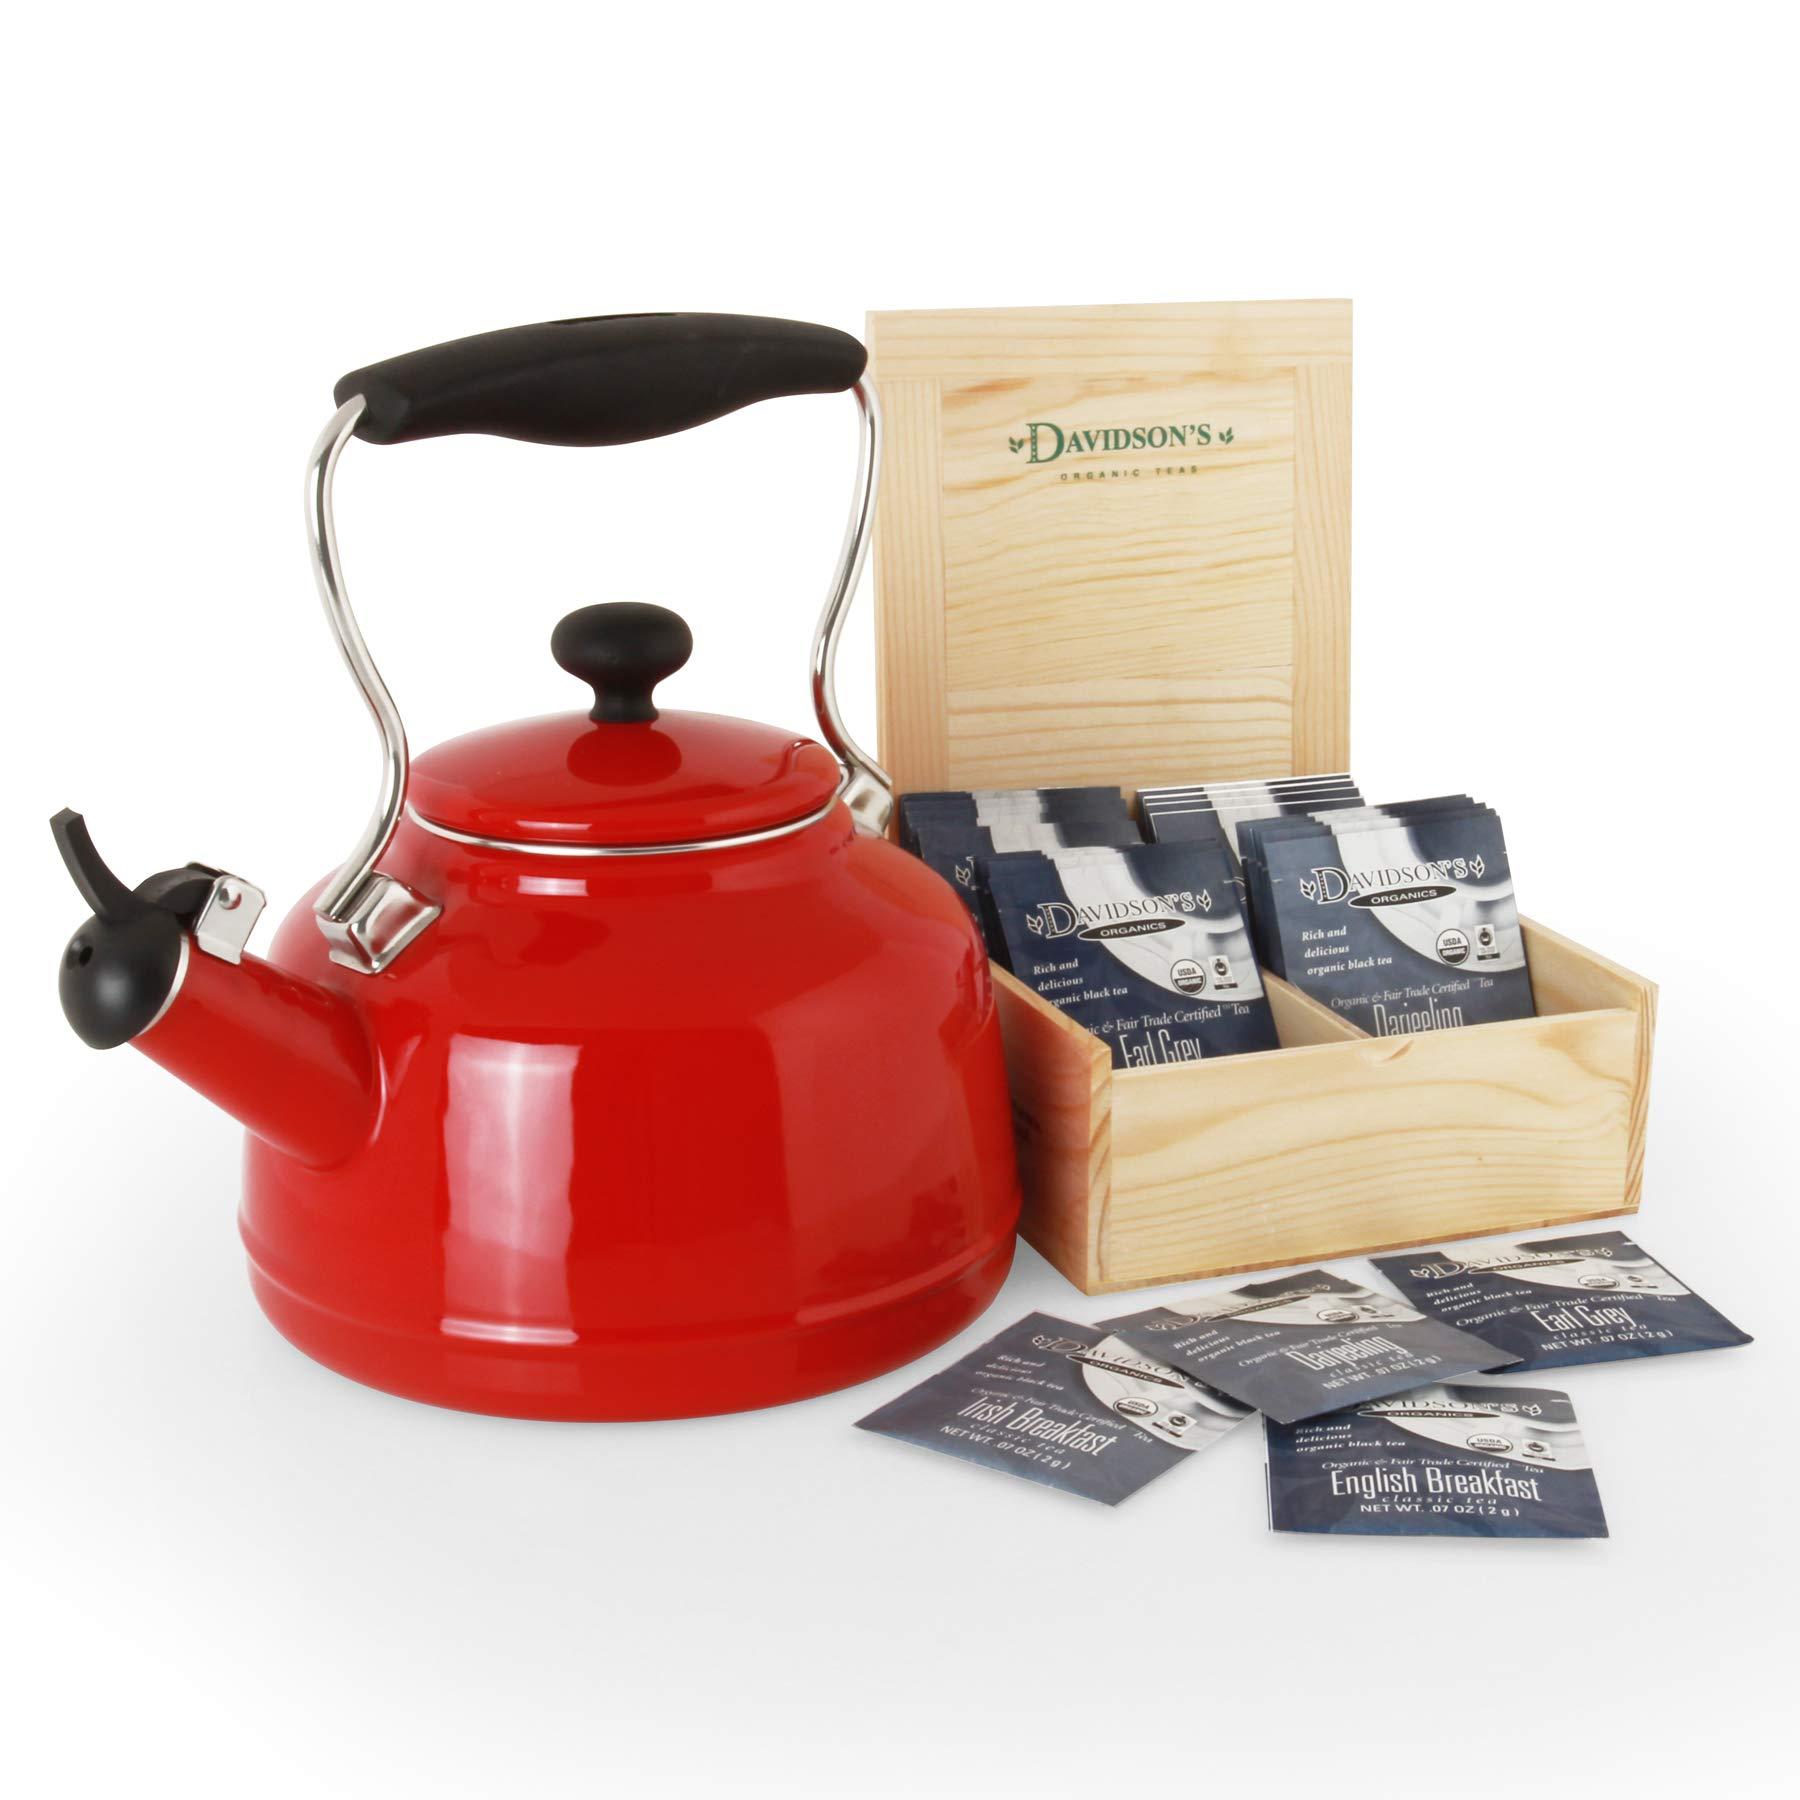 Chantal 37-Vint RE Vintage Teakettle with free Davidsons Tea Gift Box 1.7 Qt Red